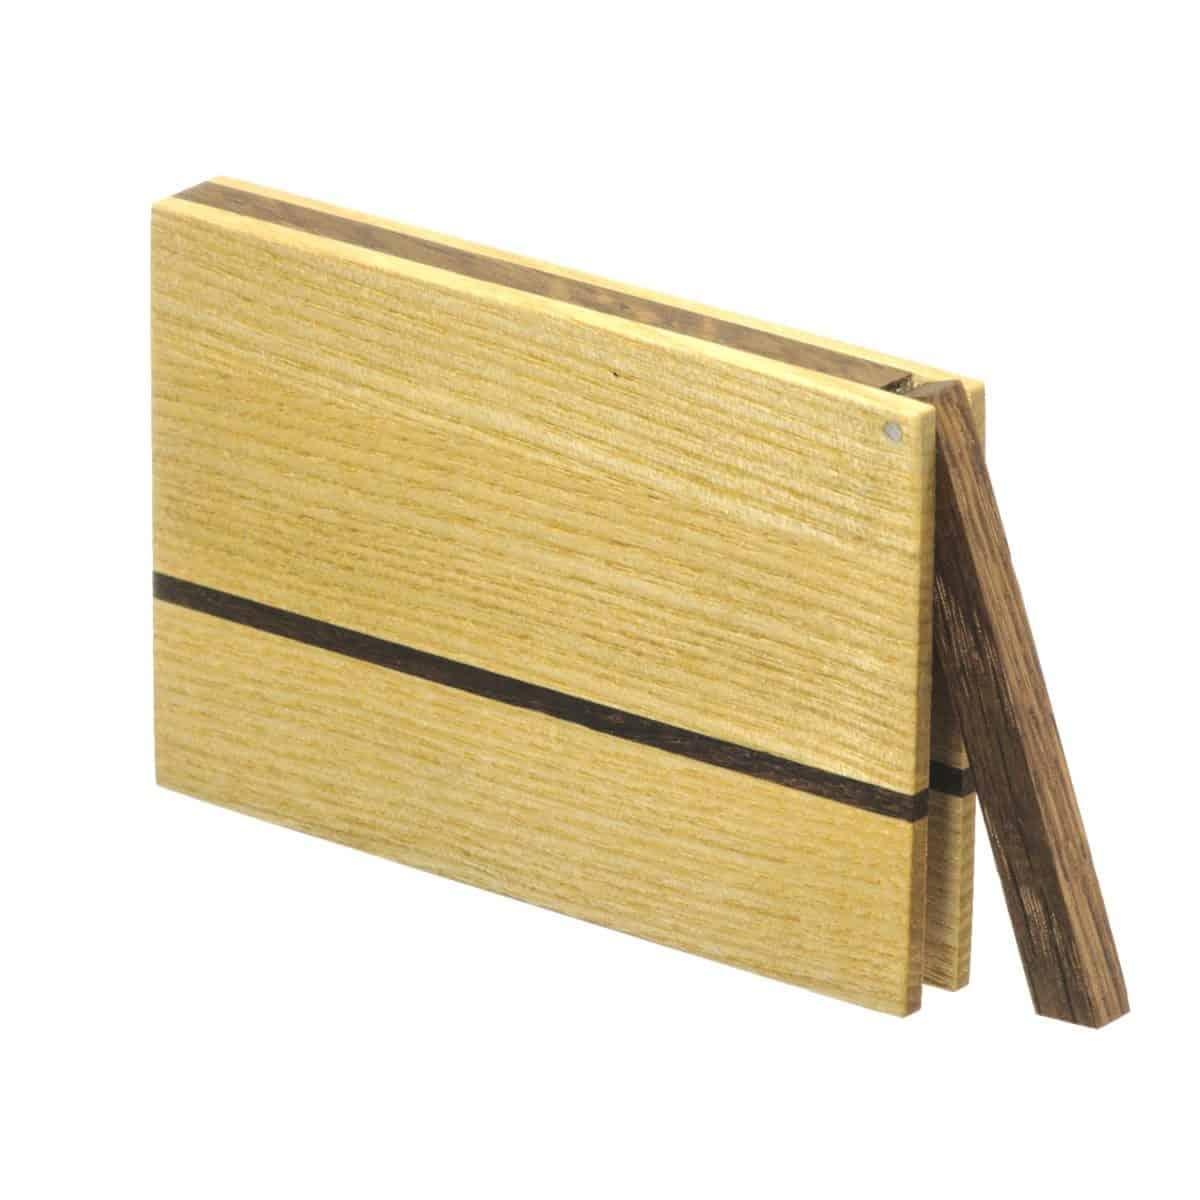 Visitenkartenetui aus Holz. Esche hell. Modell »Sophie« in kantiger Form